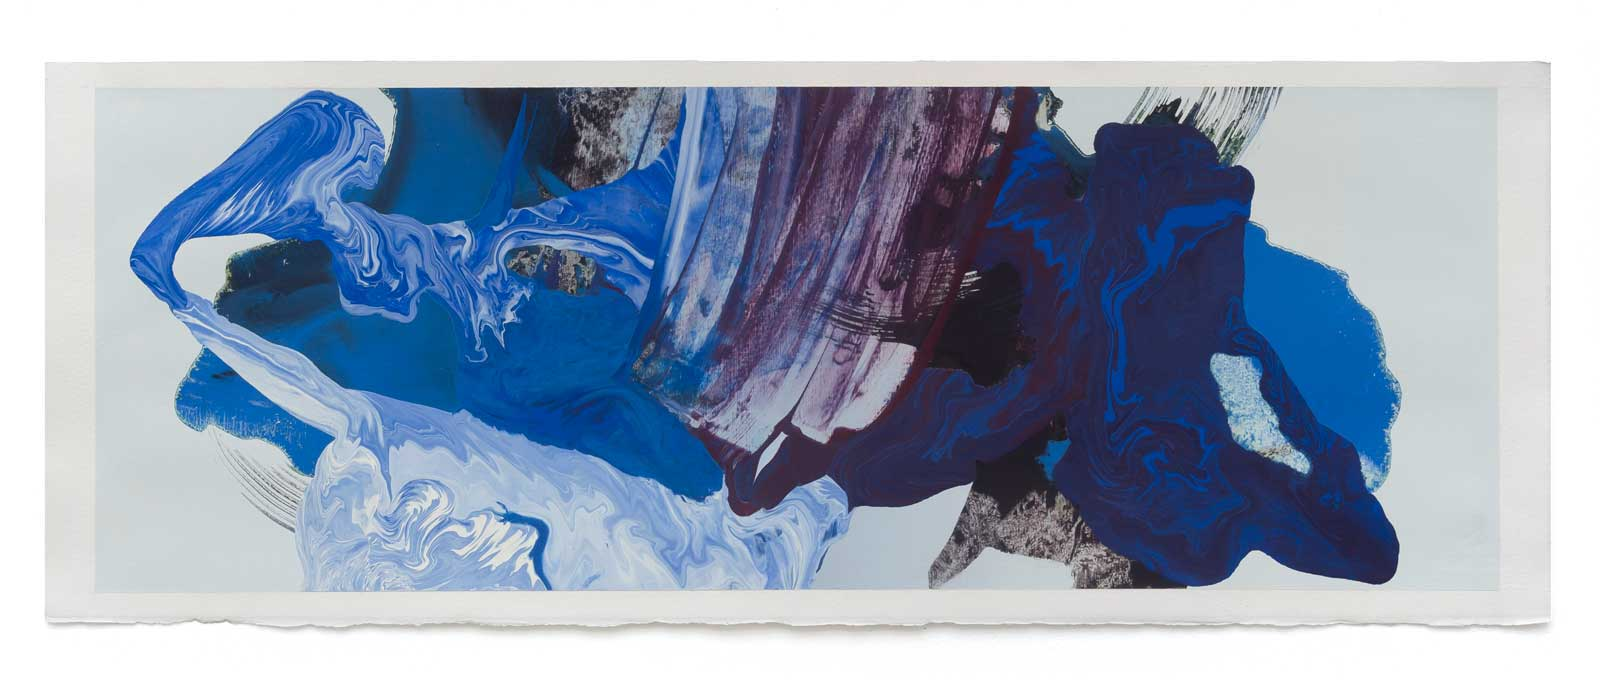 Disruptions-6-oil-on-paper-71.12 cm x 25.4 cm.